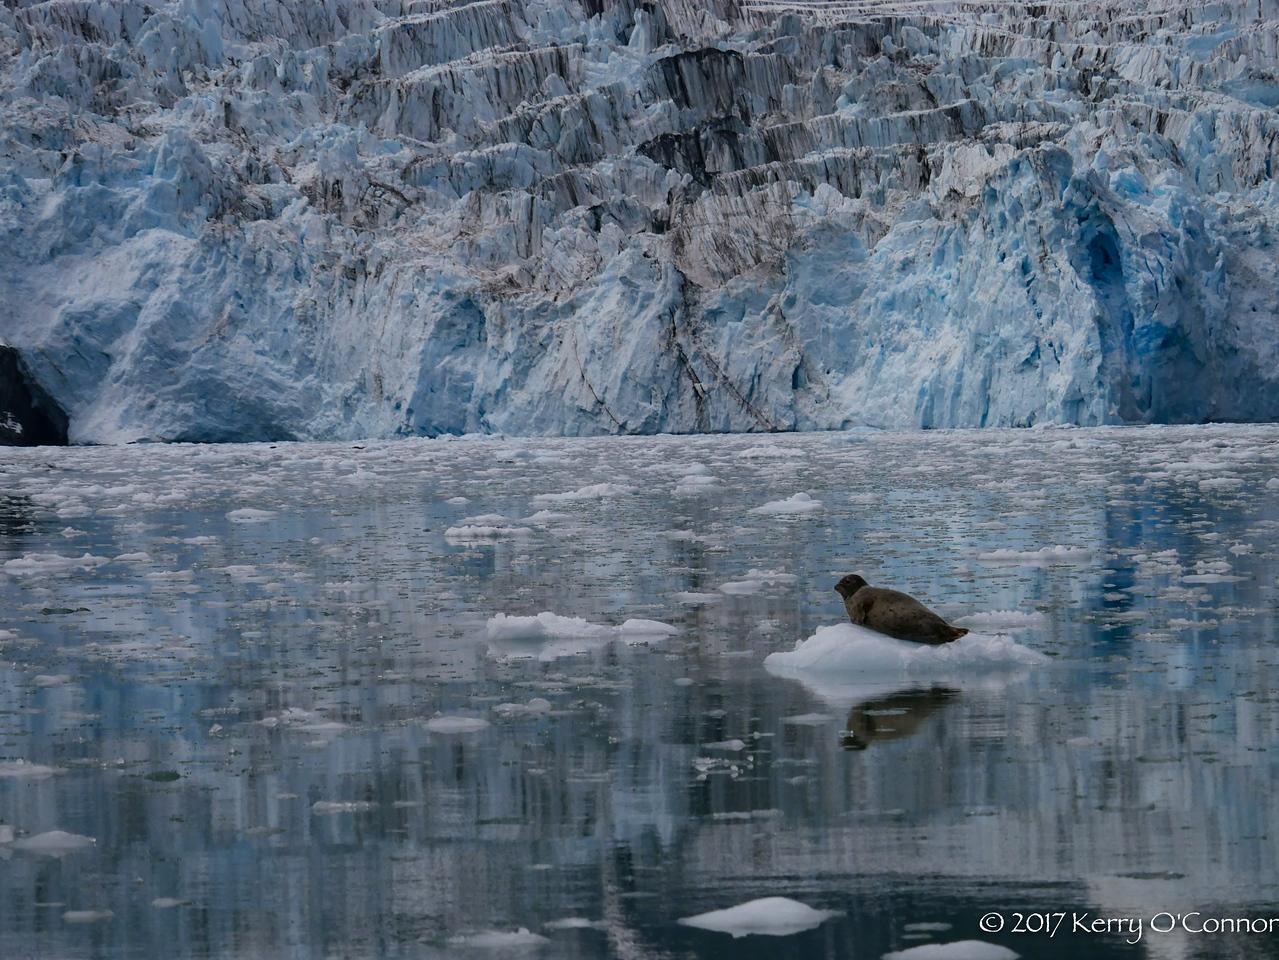 Harbor Seal in front of Surprise Glacier